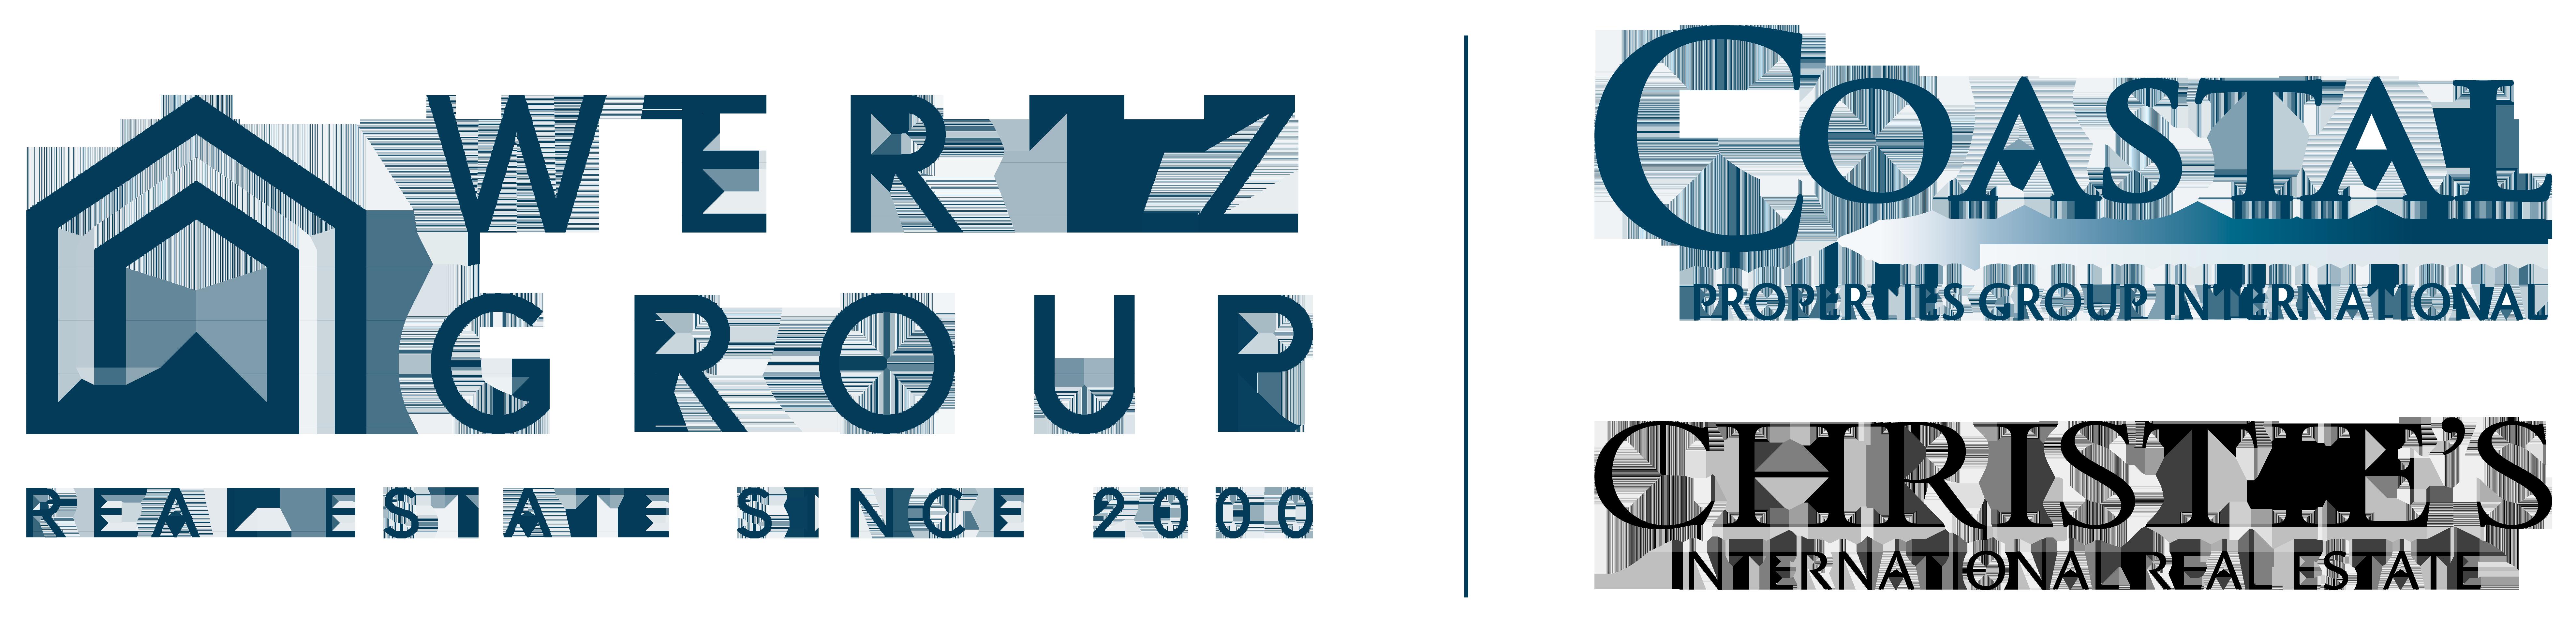 The Wertz Group logo